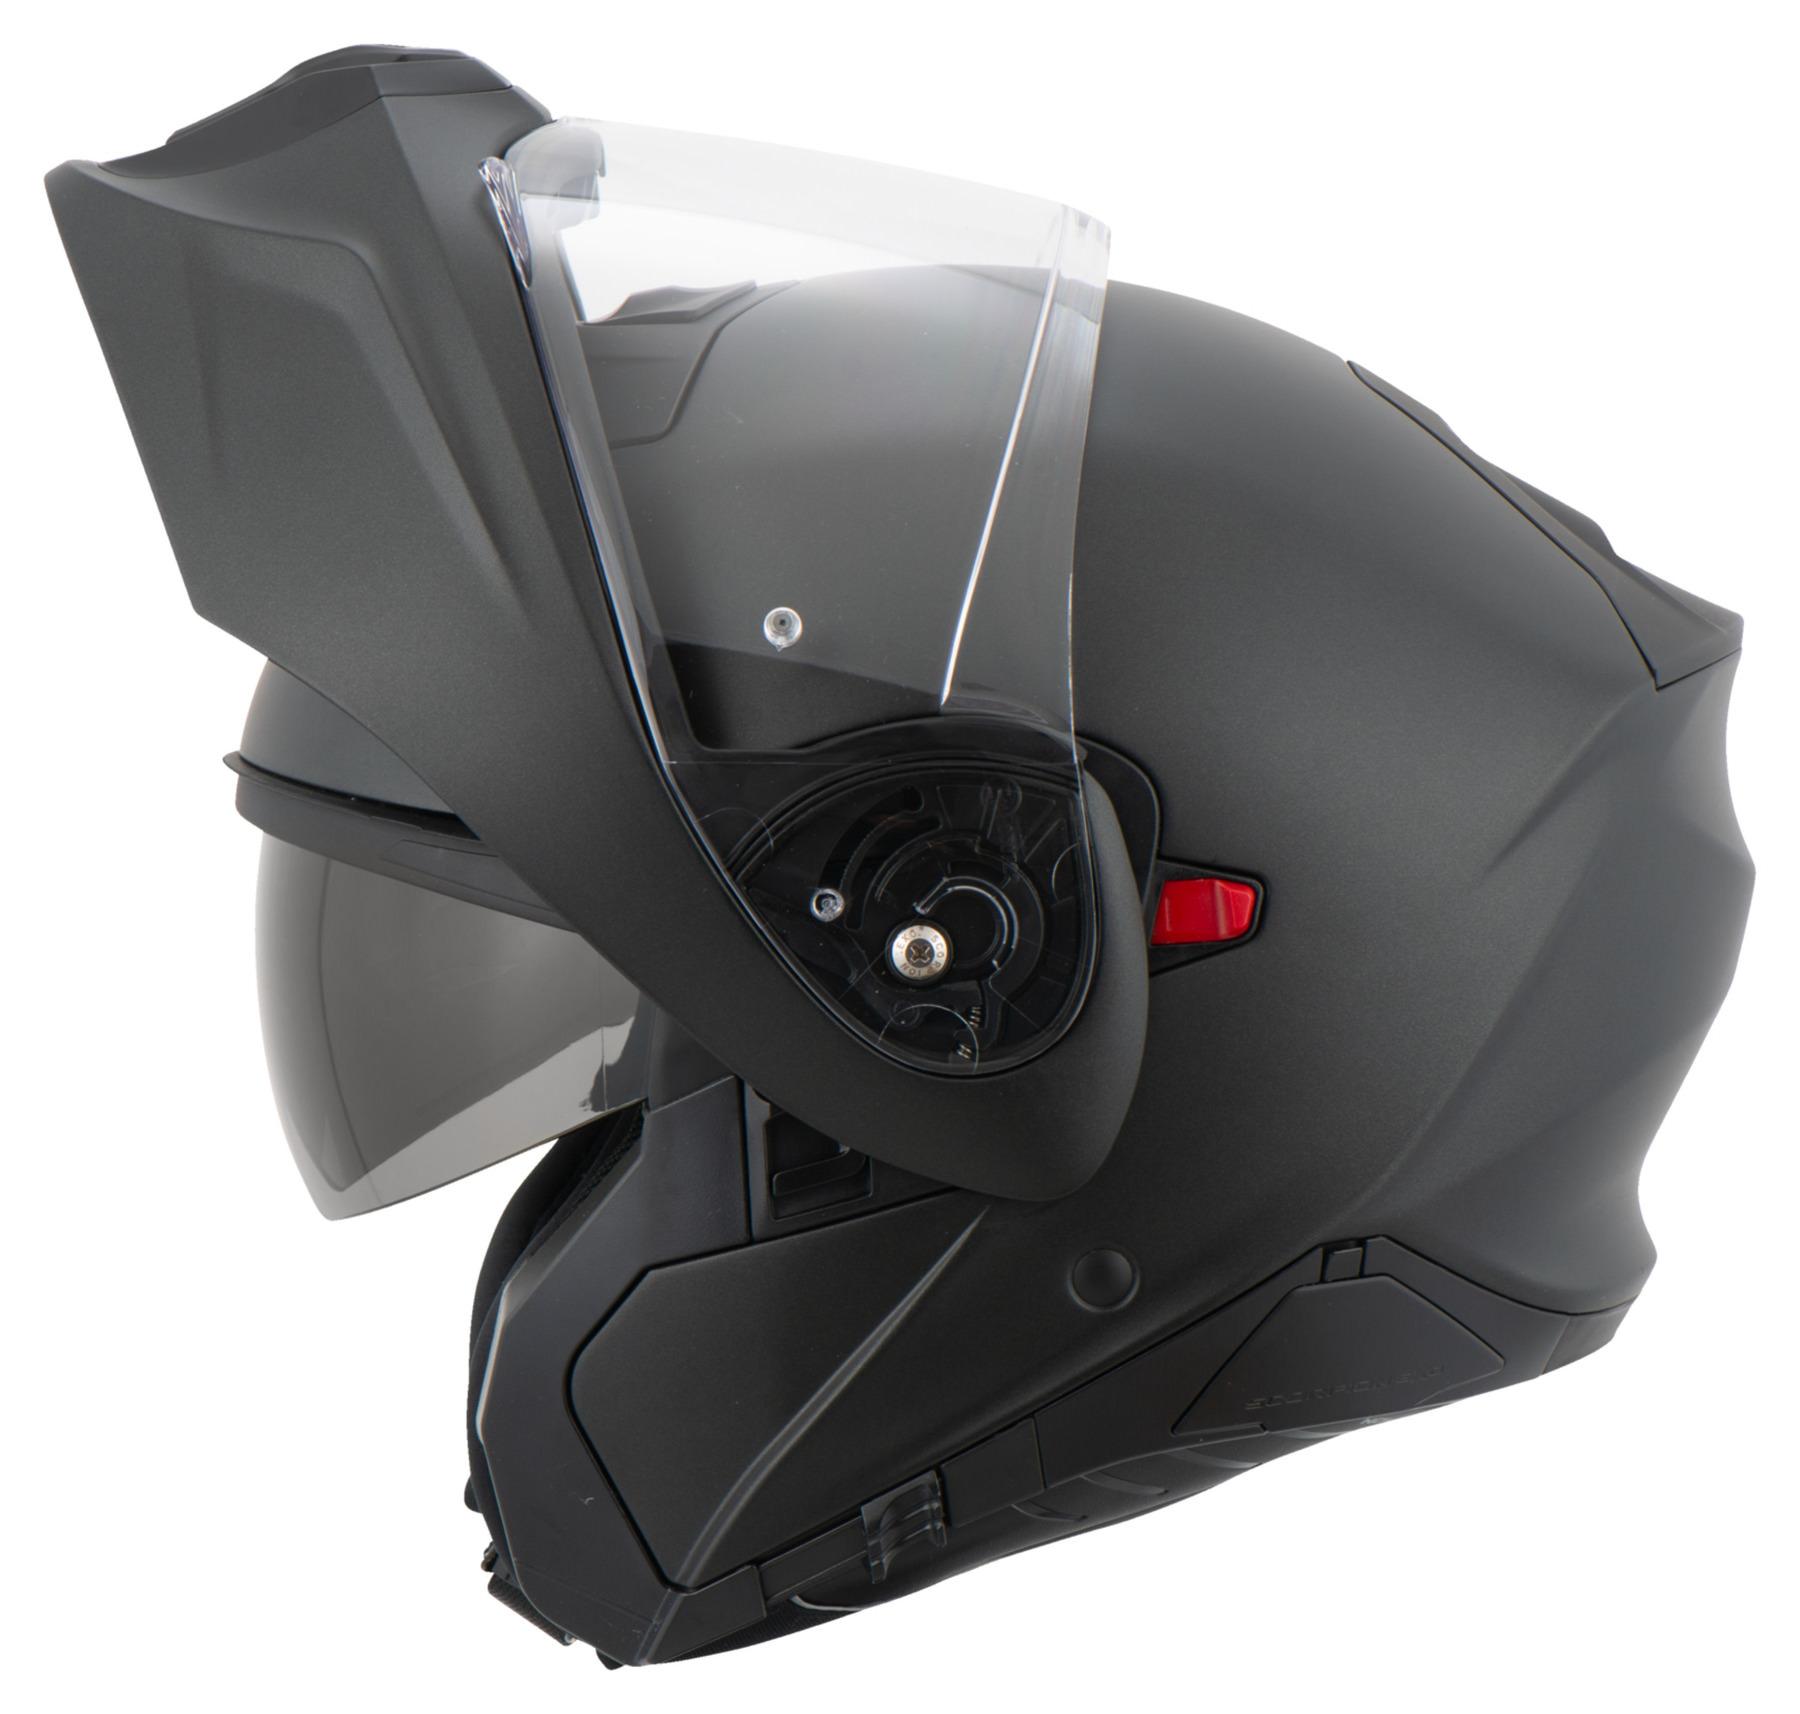 Scorpion EXO 930 BlackMatt